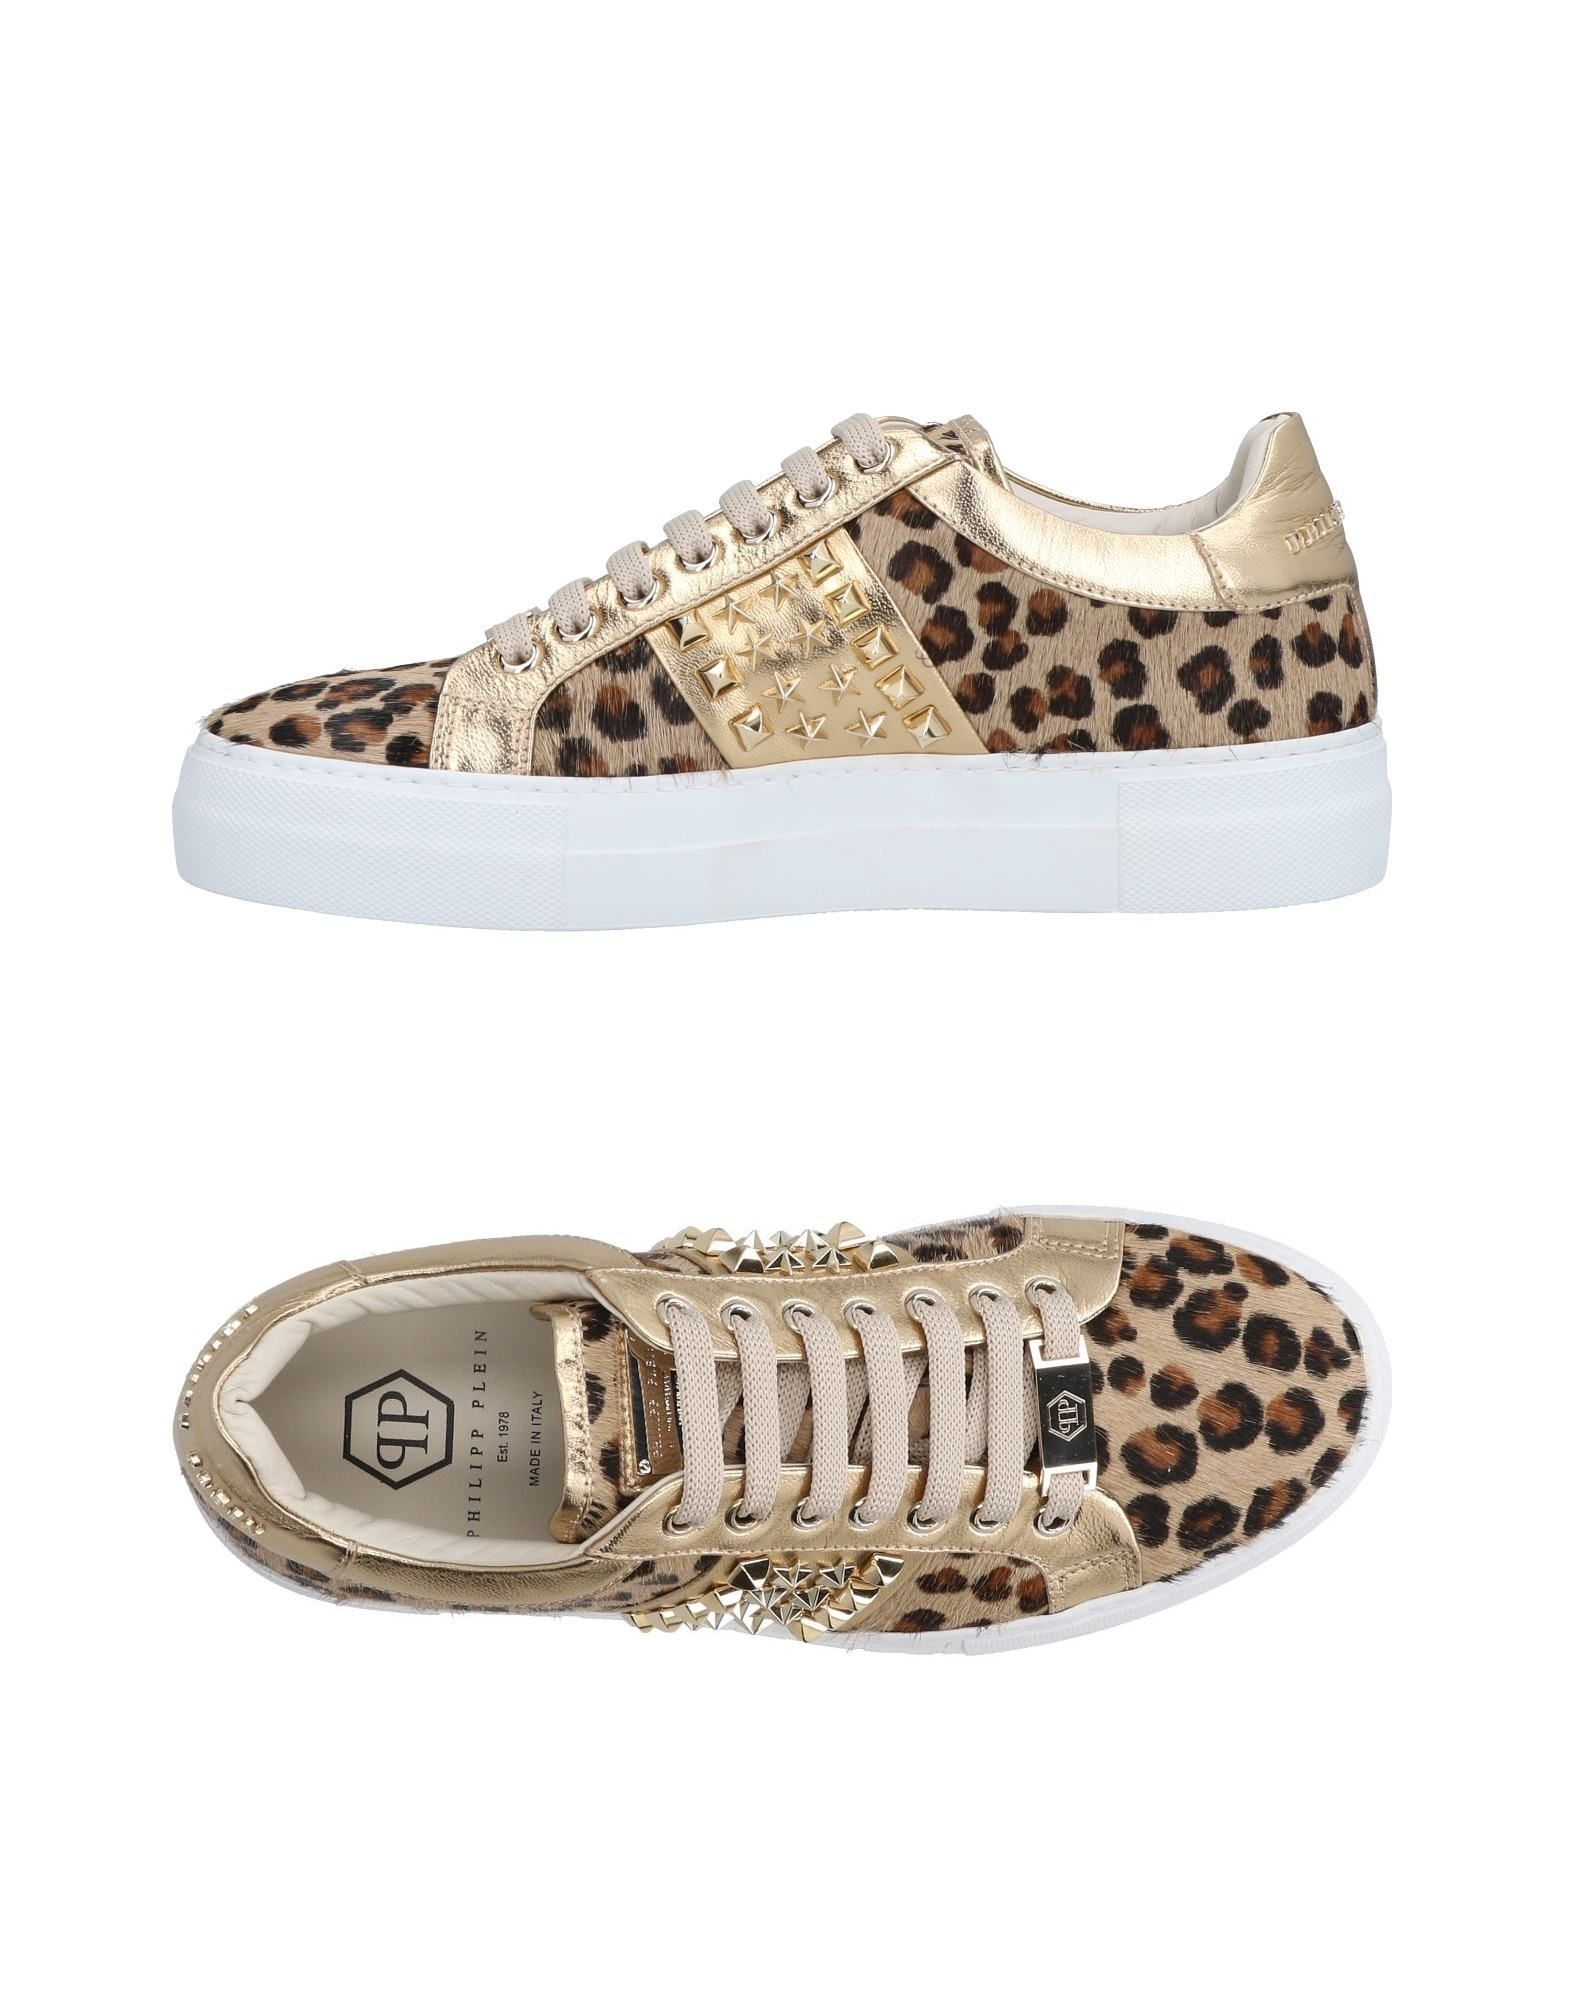 Philipp Plein Plein Sneakers - Women Philipp Plein Plein Sneakers online on  United Kingdom - 11495300JK b0b418